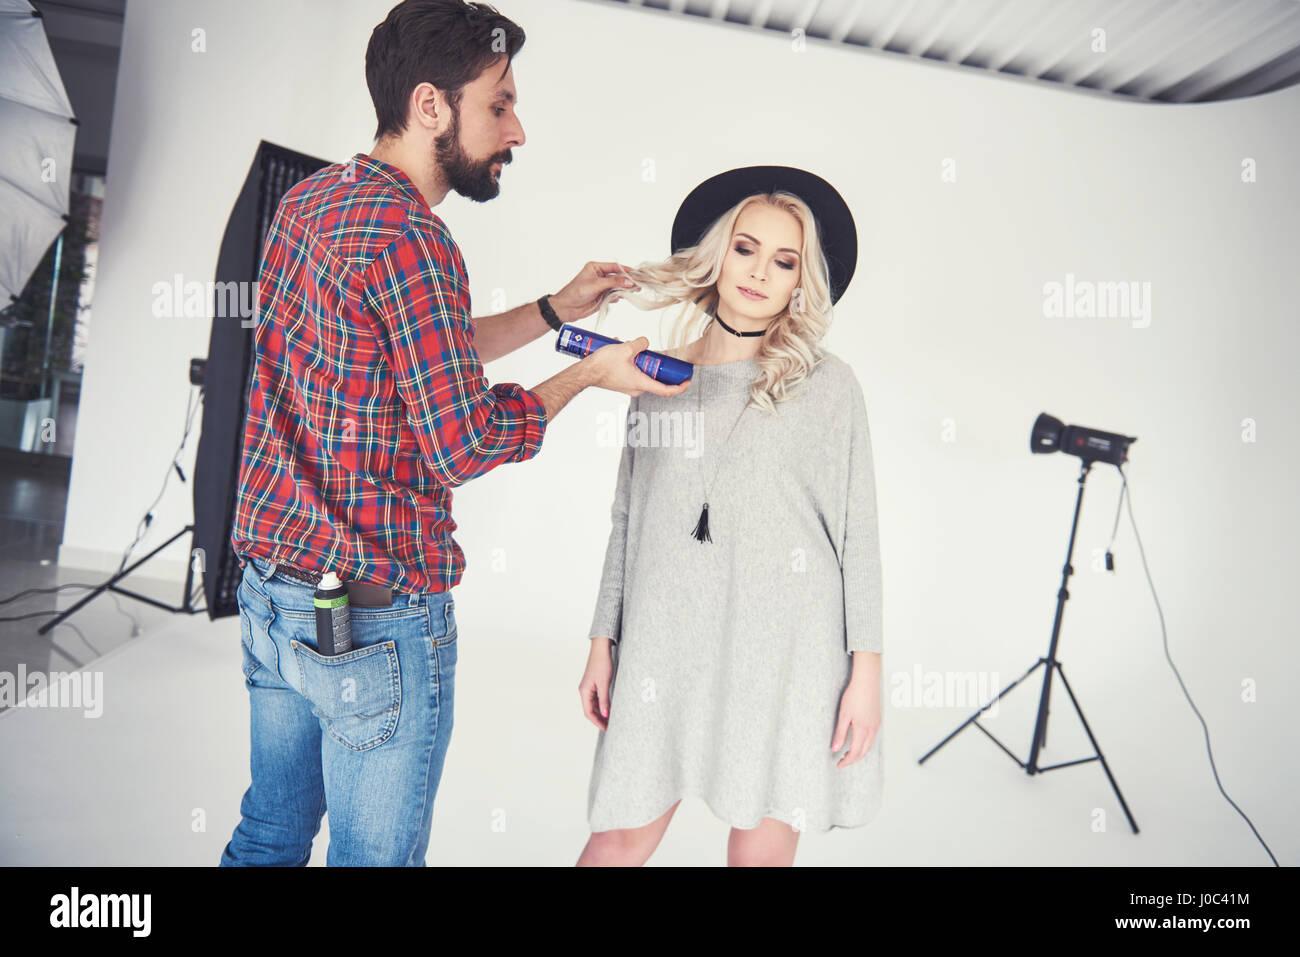 Male photographer adjusting female model's hair on studio white background - Stock Image